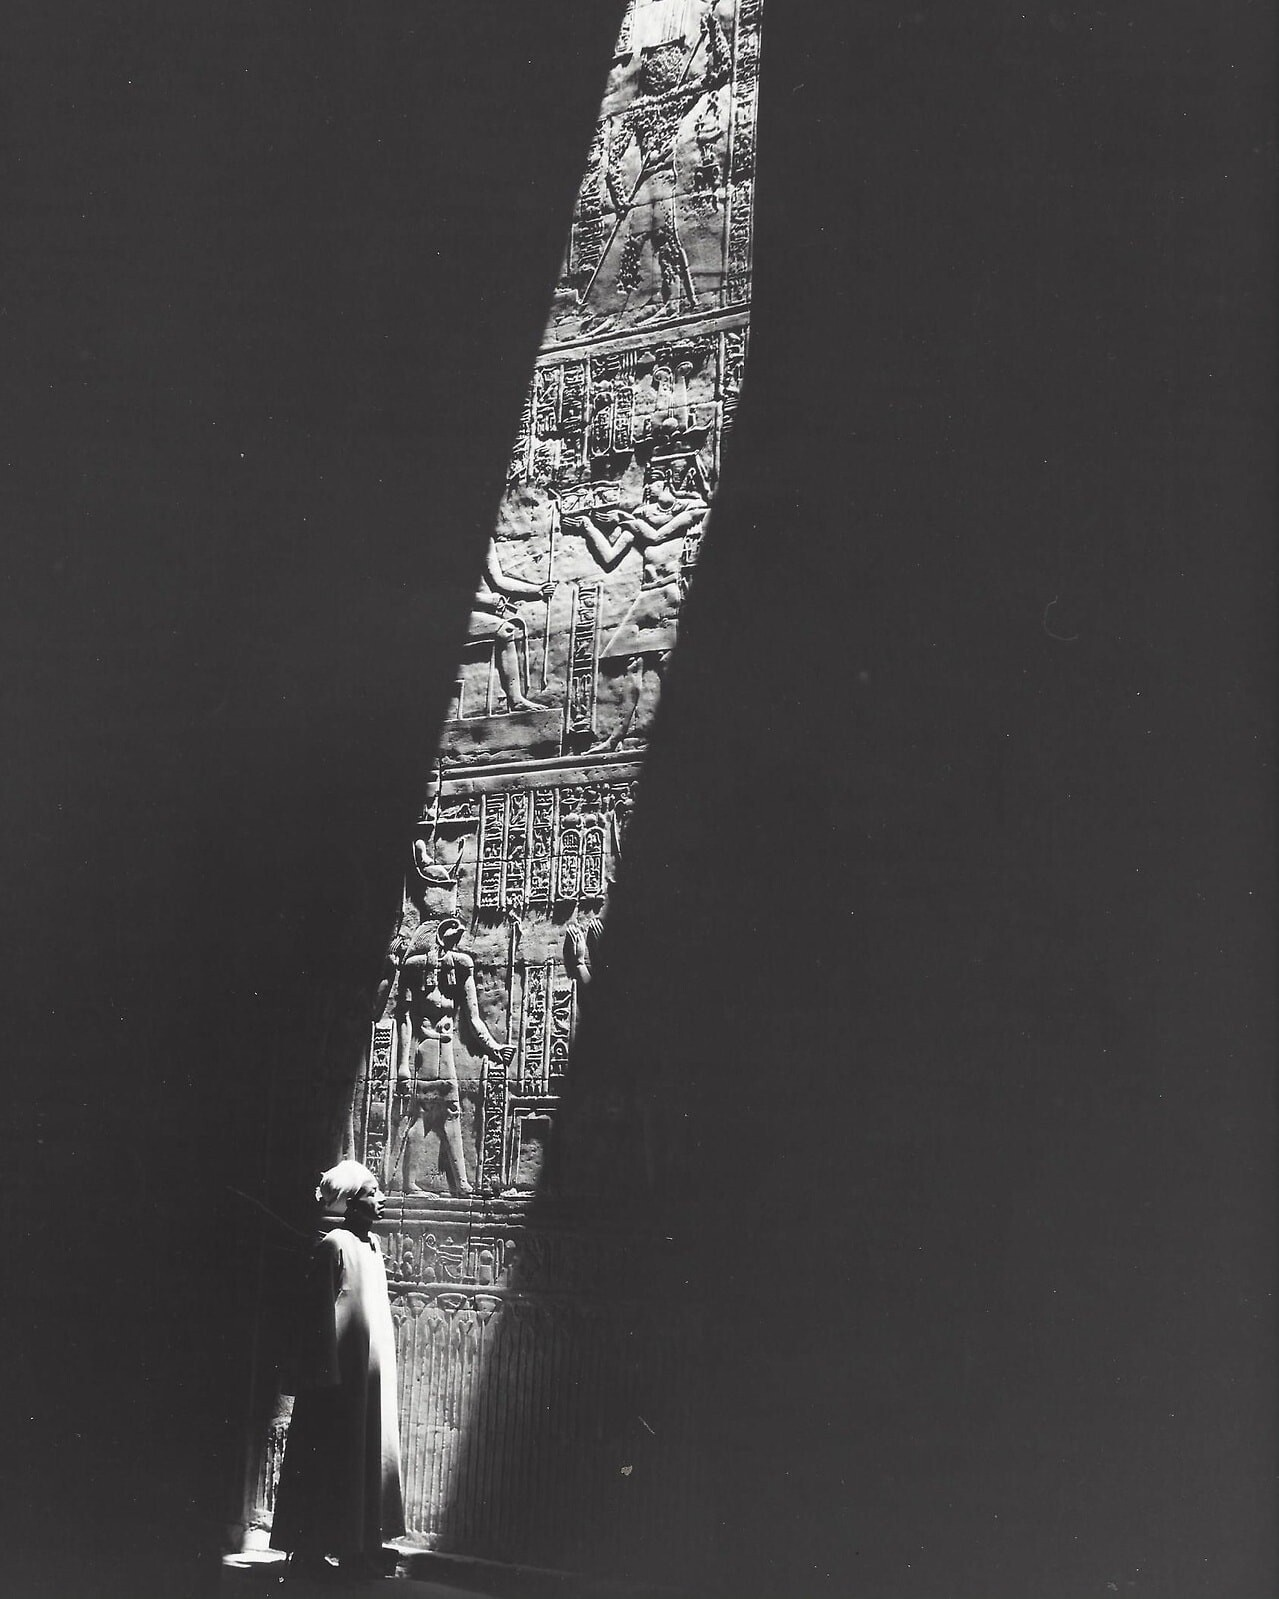 Древнеегипетский рельеф на стене храма, 1968. Фотограф Кис Шерер